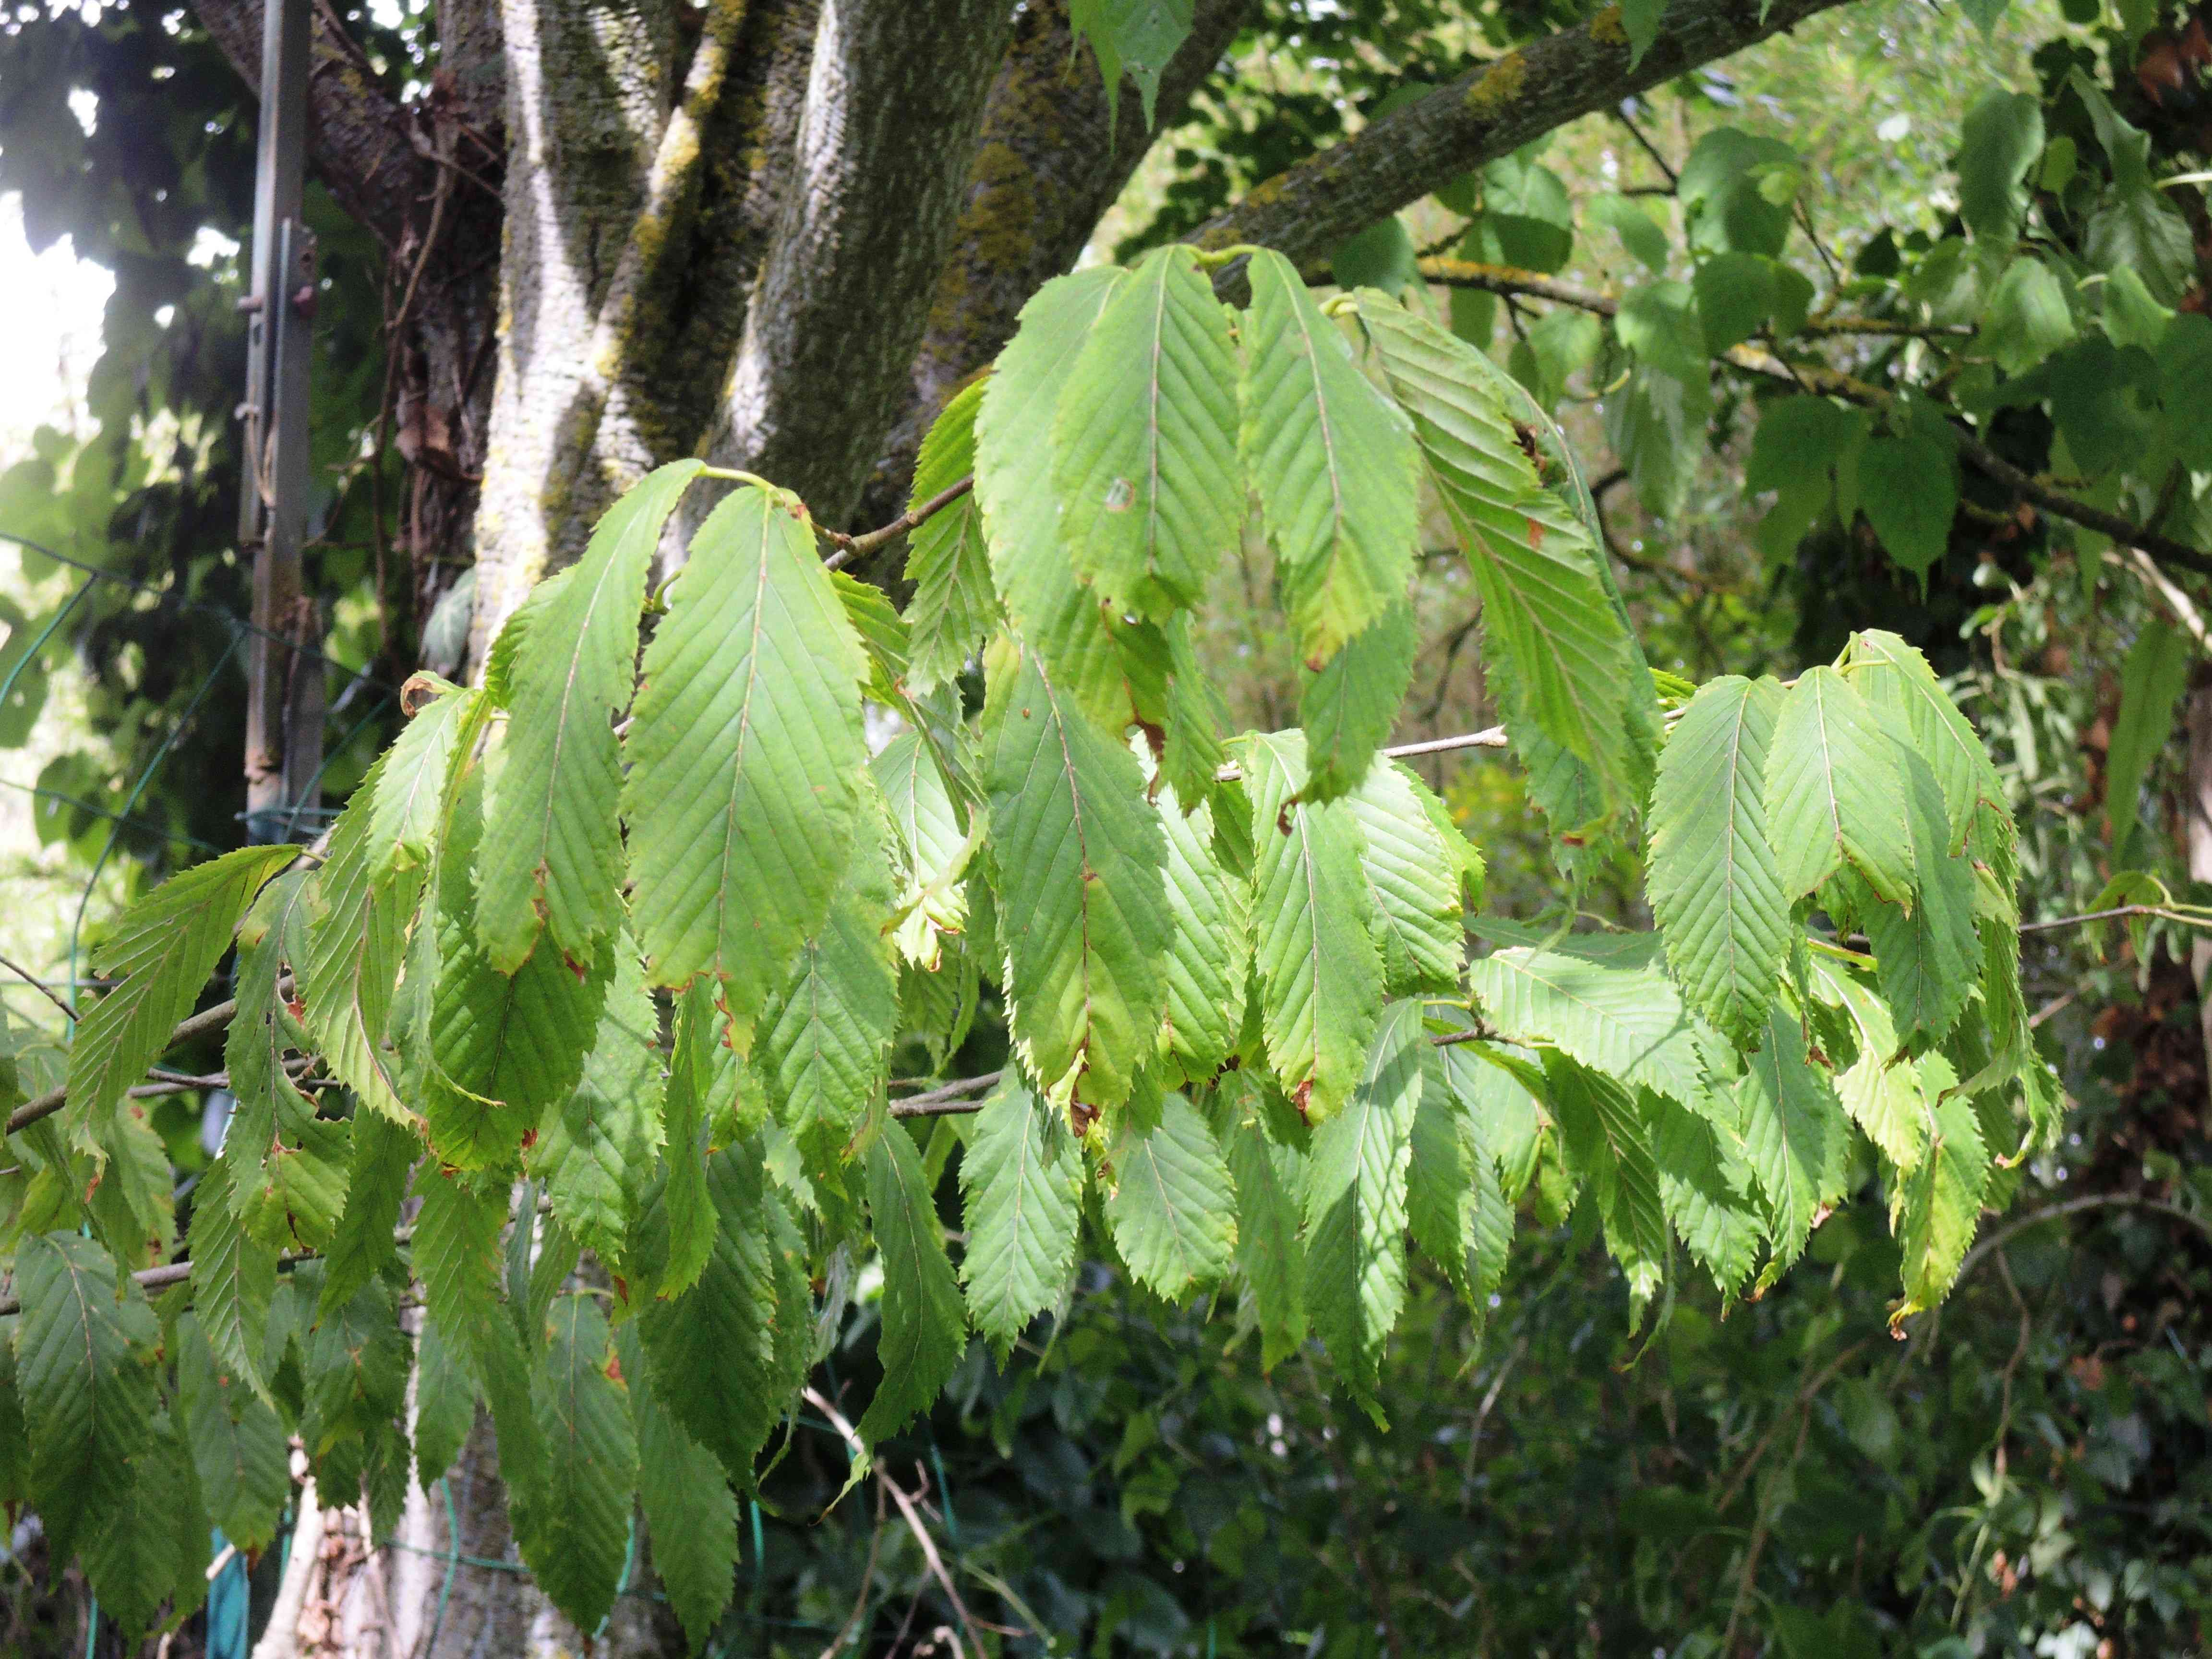 Acer Carpinifolium Acéracées